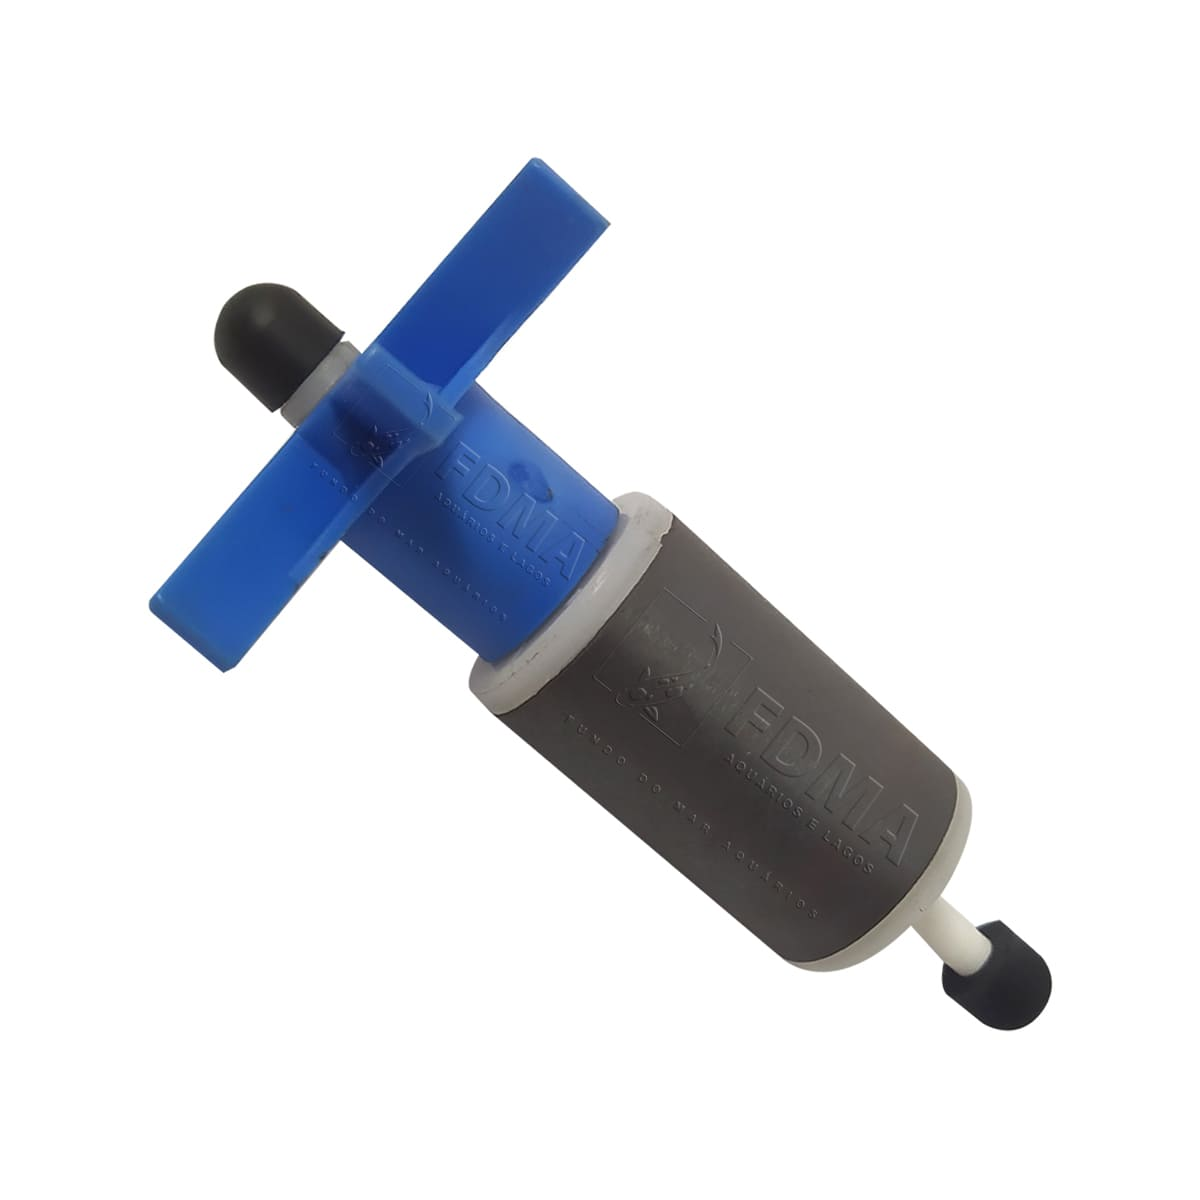 Impeller Bomba Rock Wp2000 Reator Cr 150